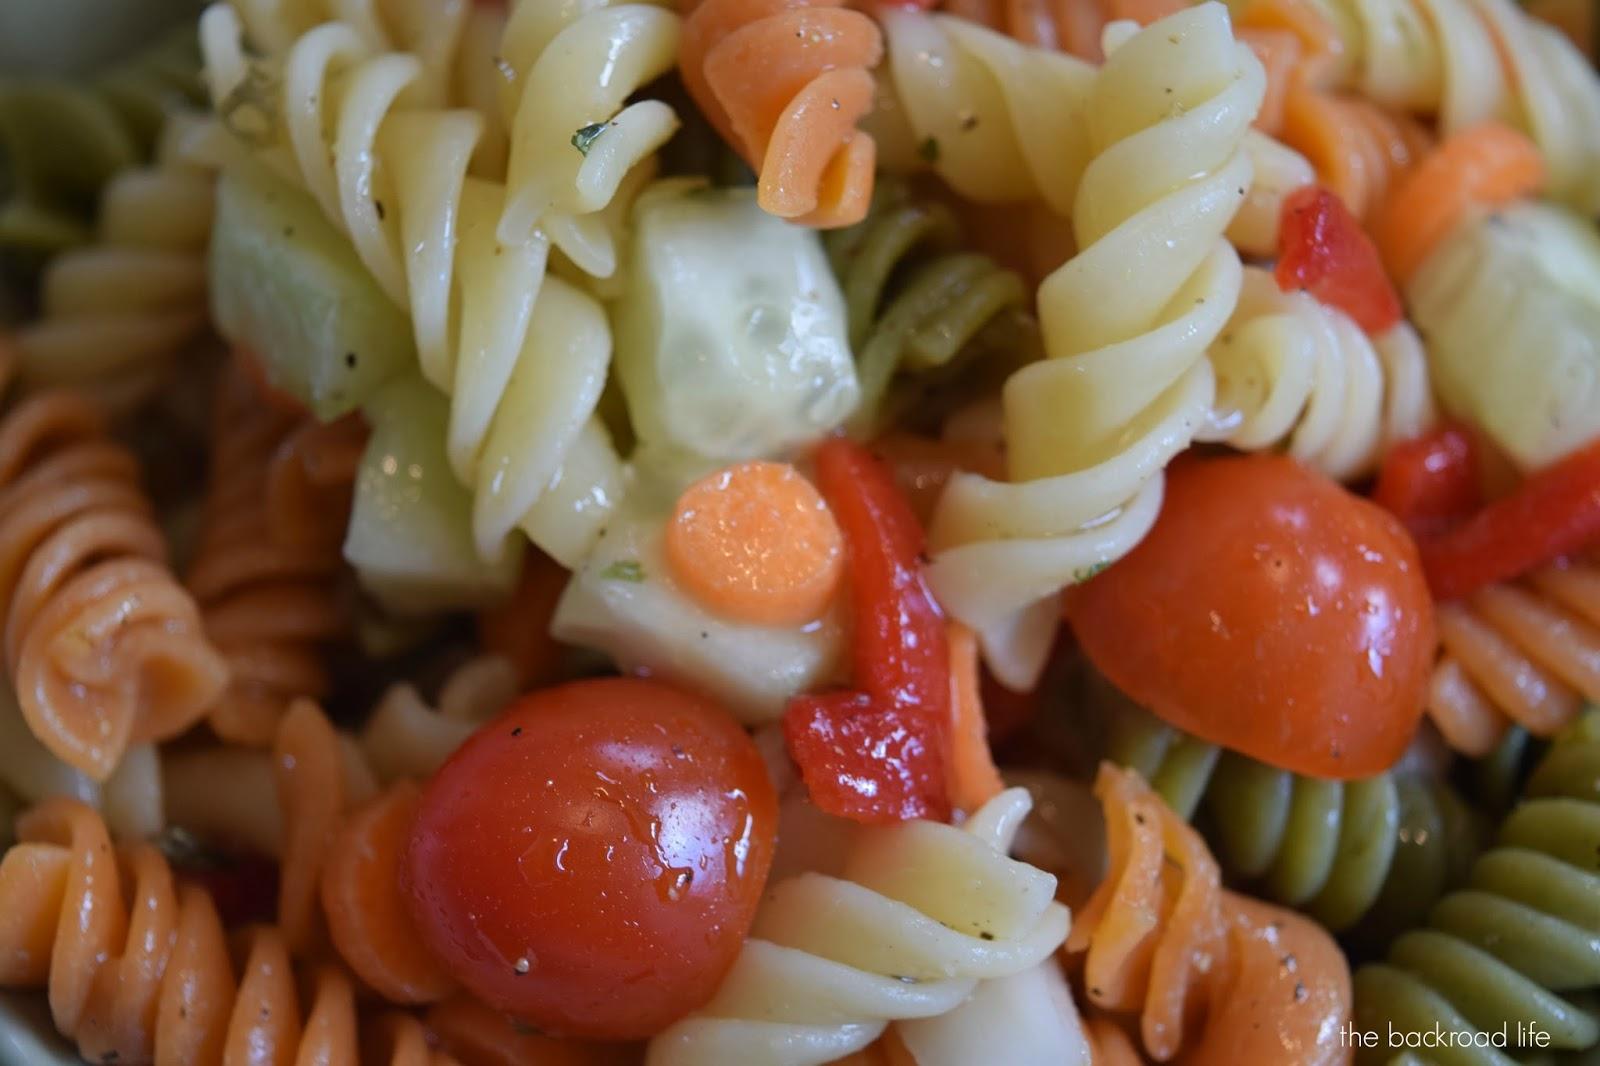 The Backroad Life: Garden Pasta Salad